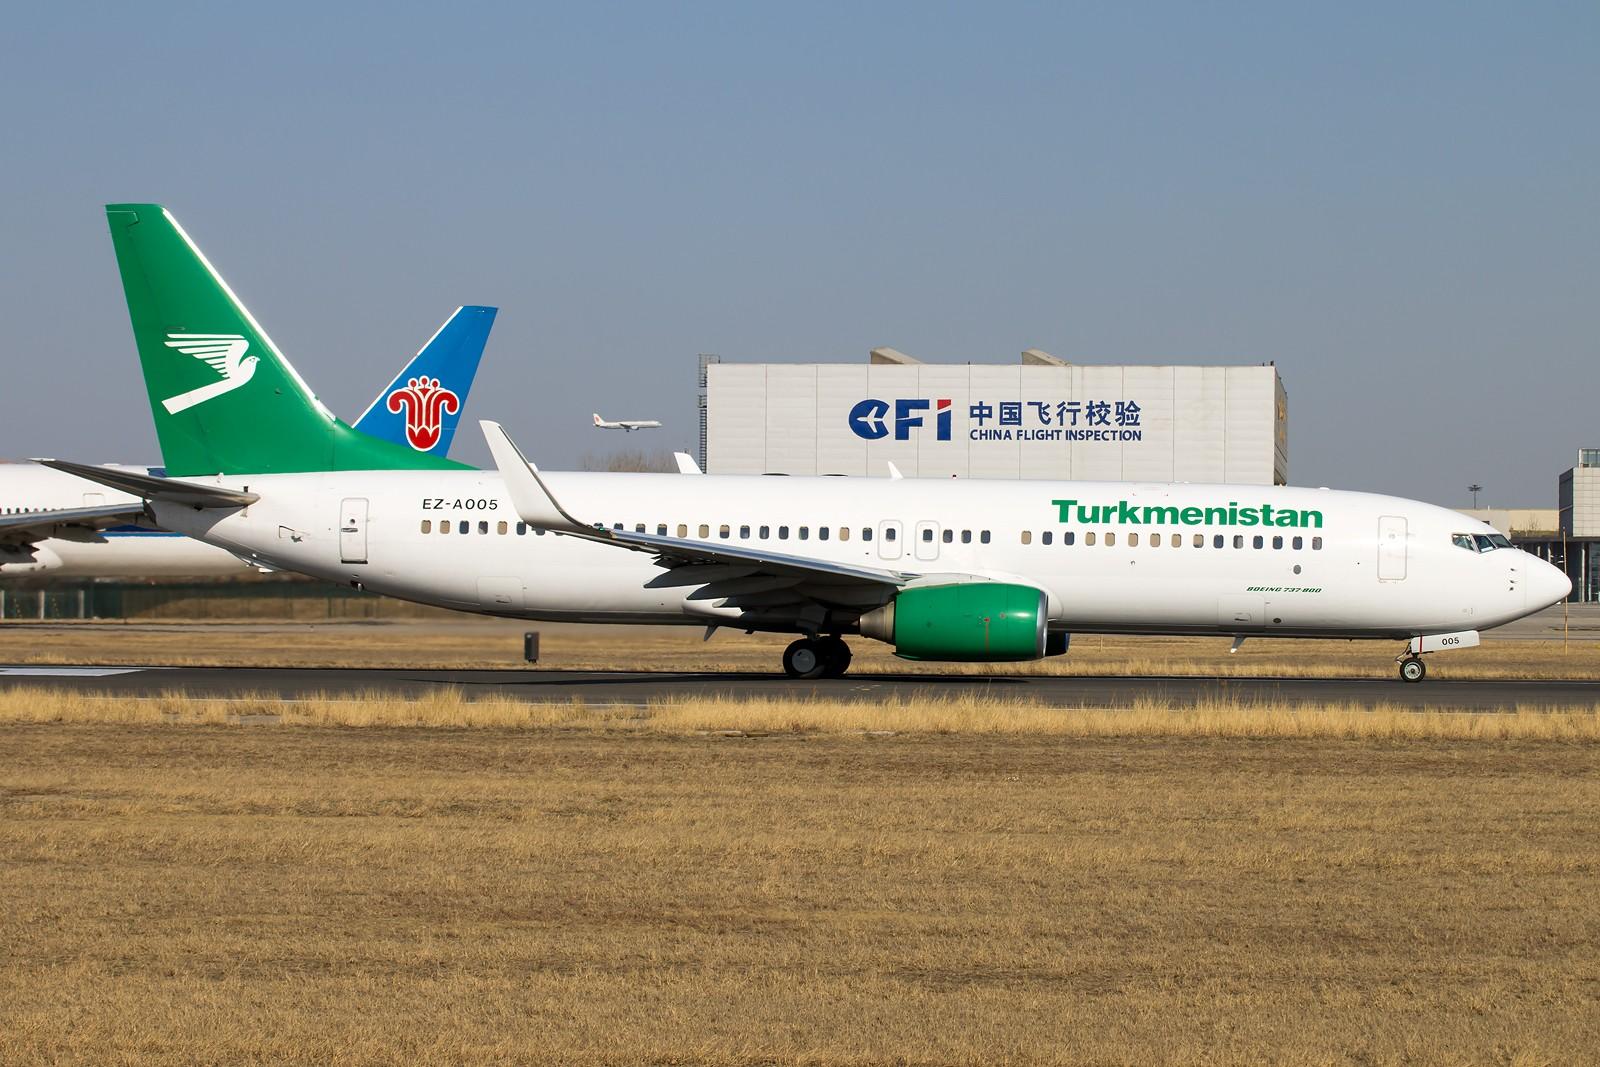 Re:[原创]常规货一组[10pics] BOEING 737-800 EZ-A005 中国北京首都国际机场